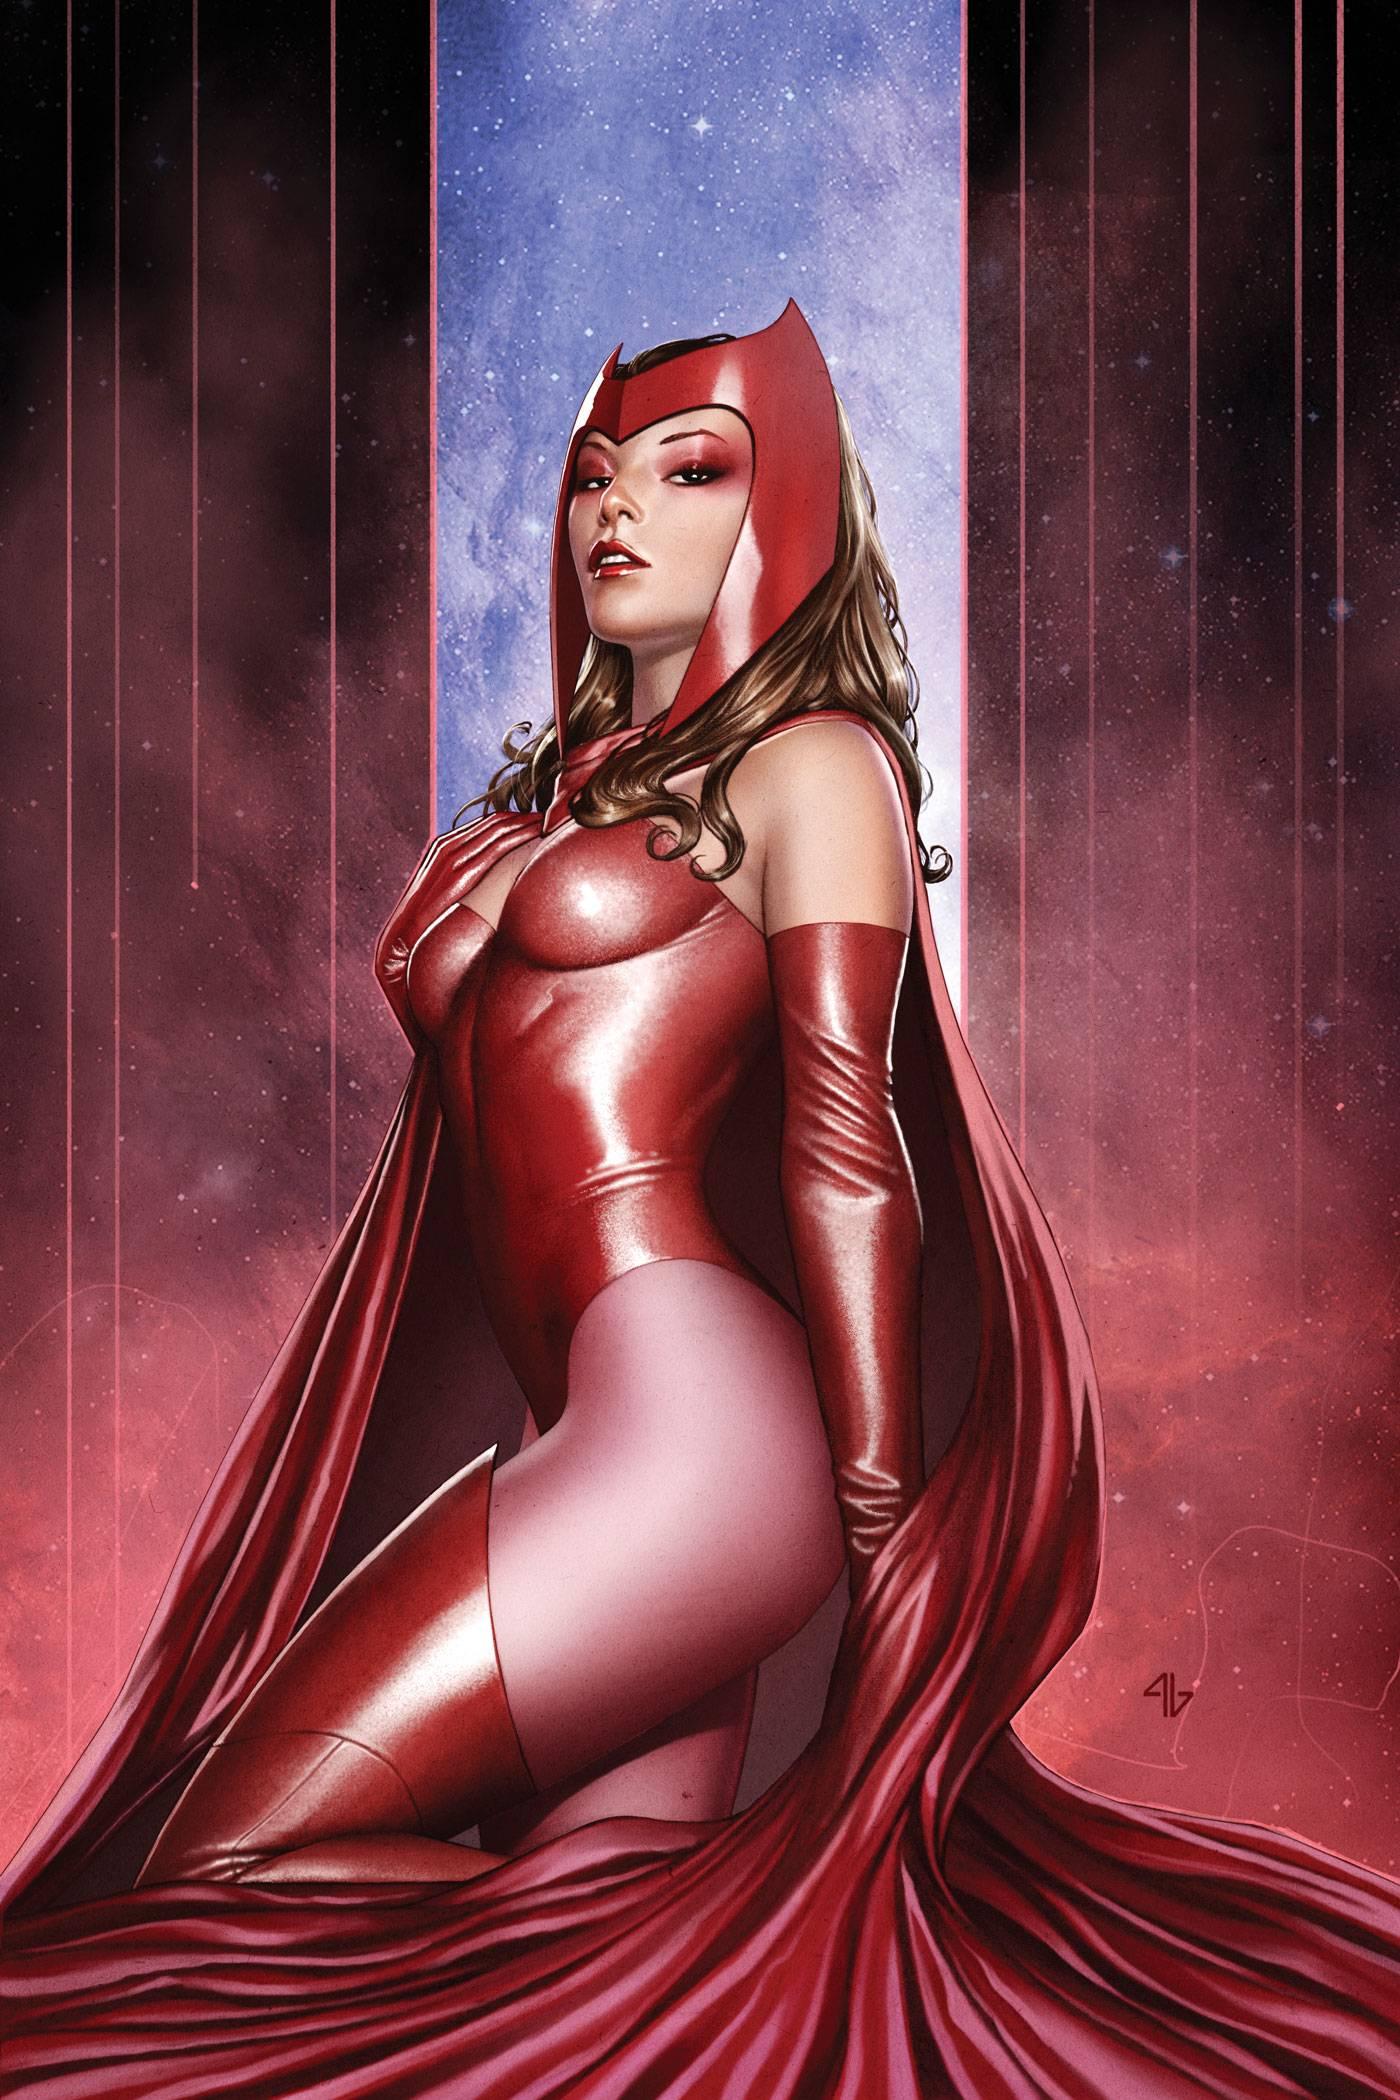 Datei:Scarlet witch.jpg